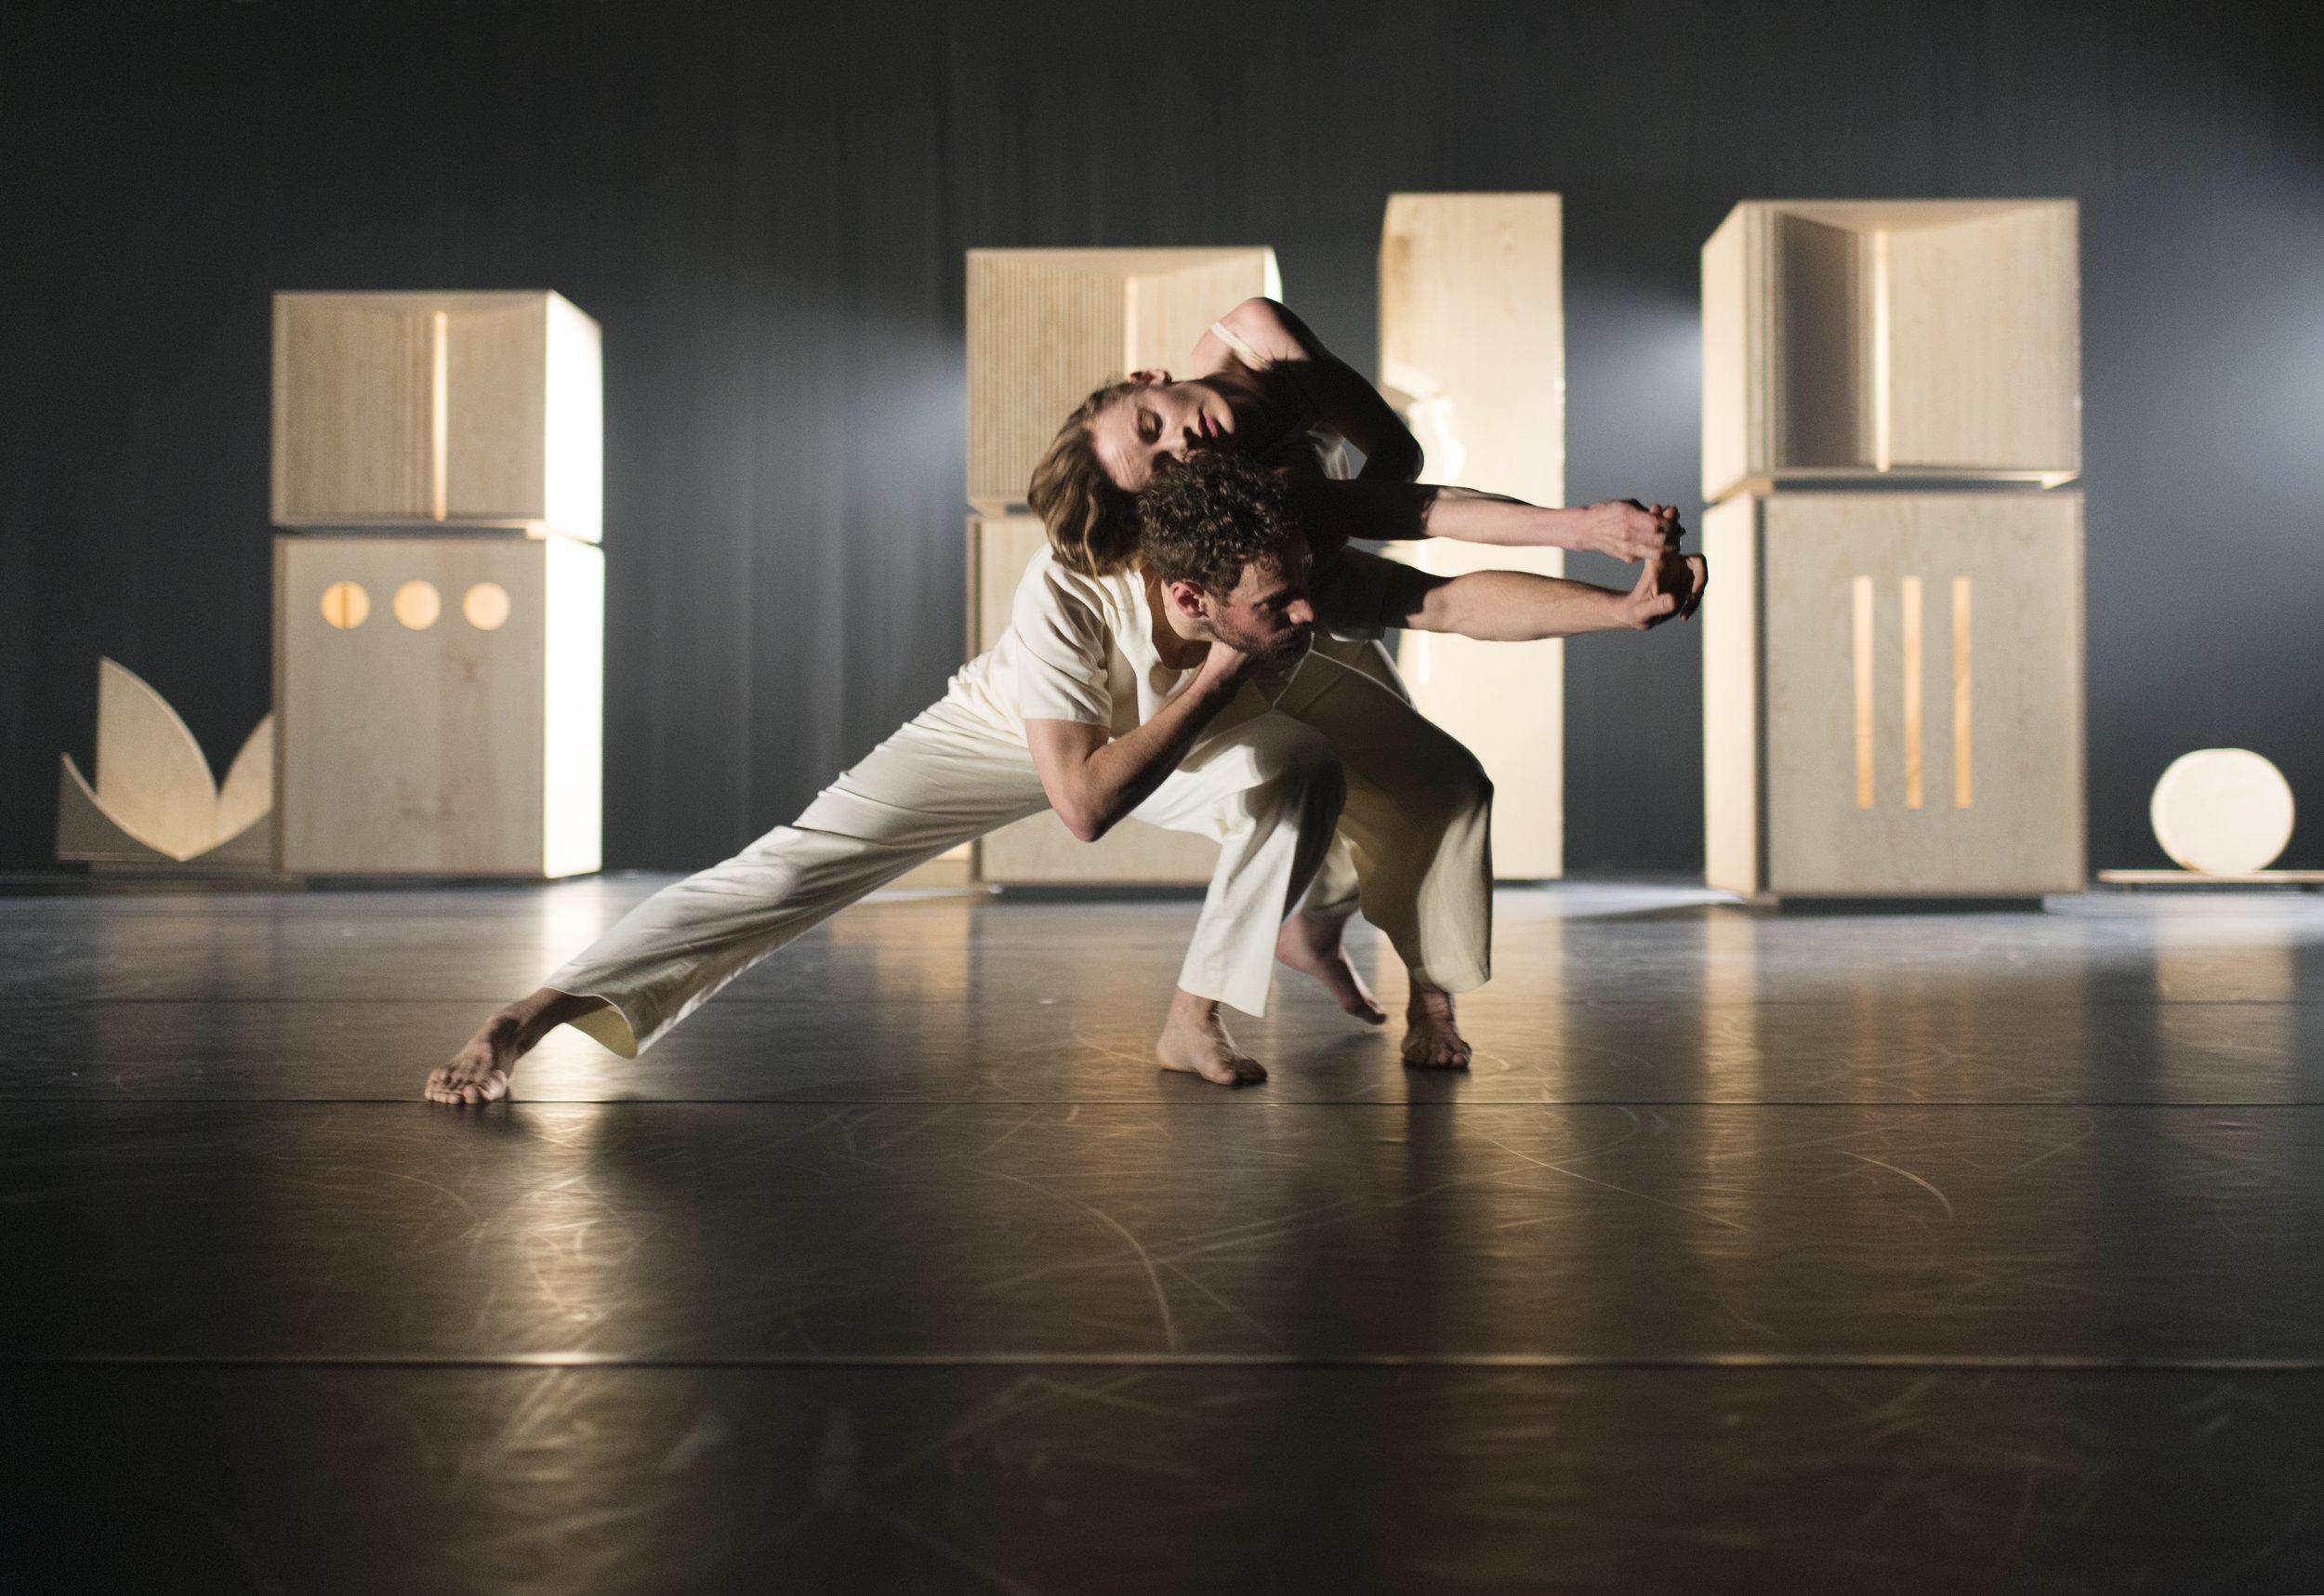 Linked - Choreography byGuro Nagelhus Schia & Vebjørn SundbyRead more